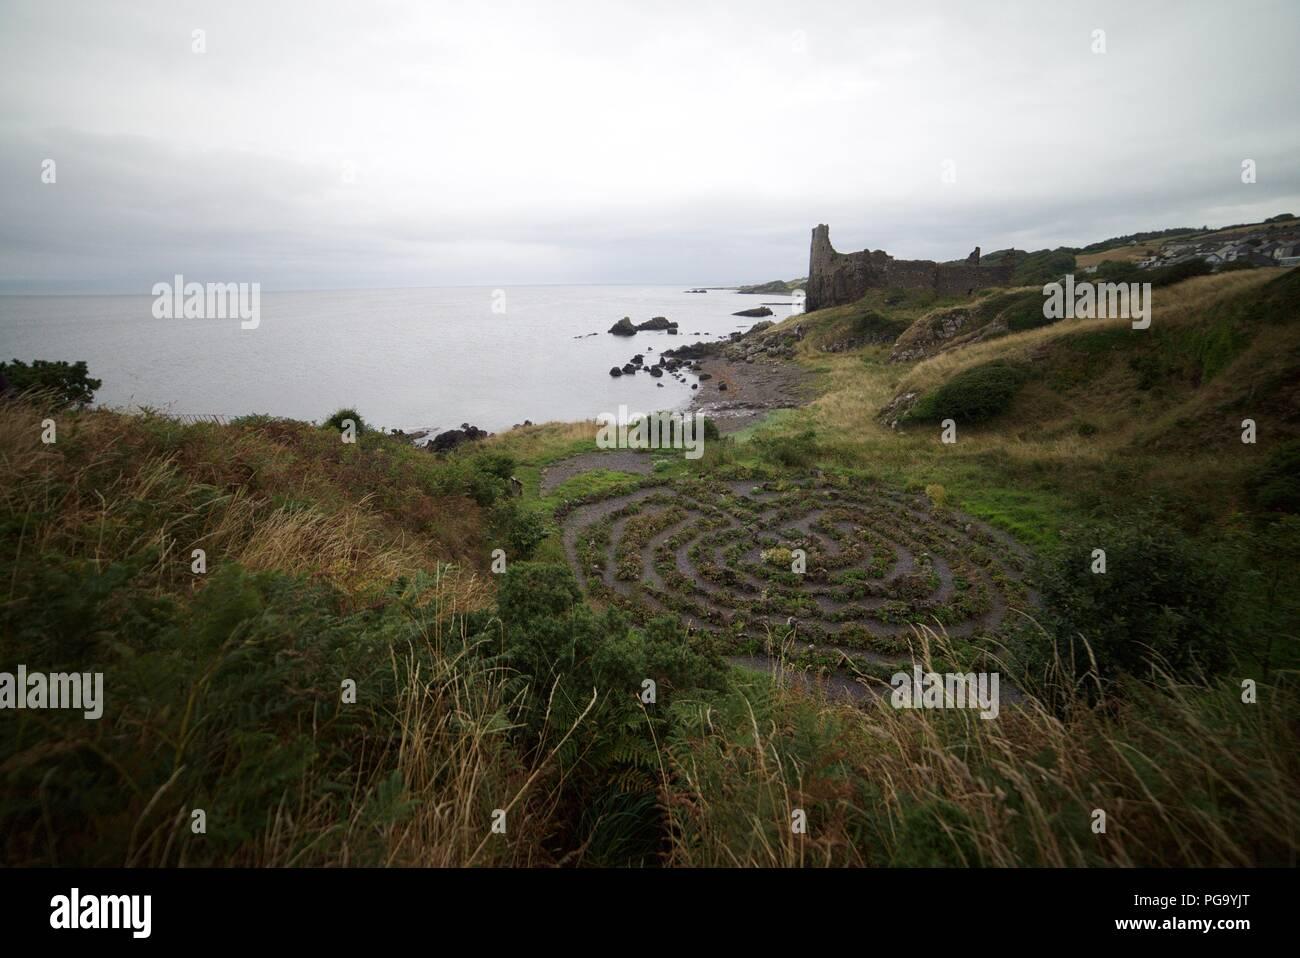 The maze next to Dunure Castle, Carrick Coast, Ayrshire. - Stock Image